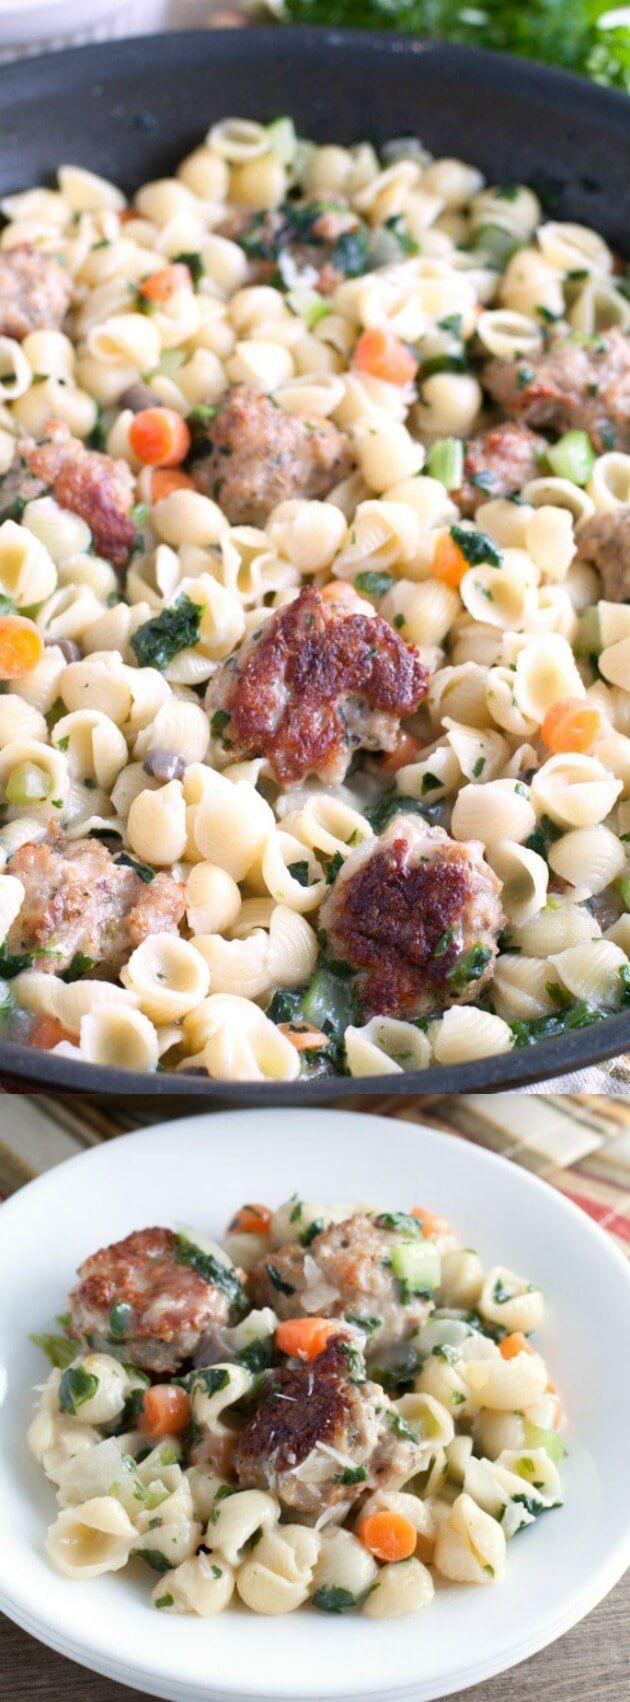 Italian Wedding Soup Dinner Italian recipes, Dinner